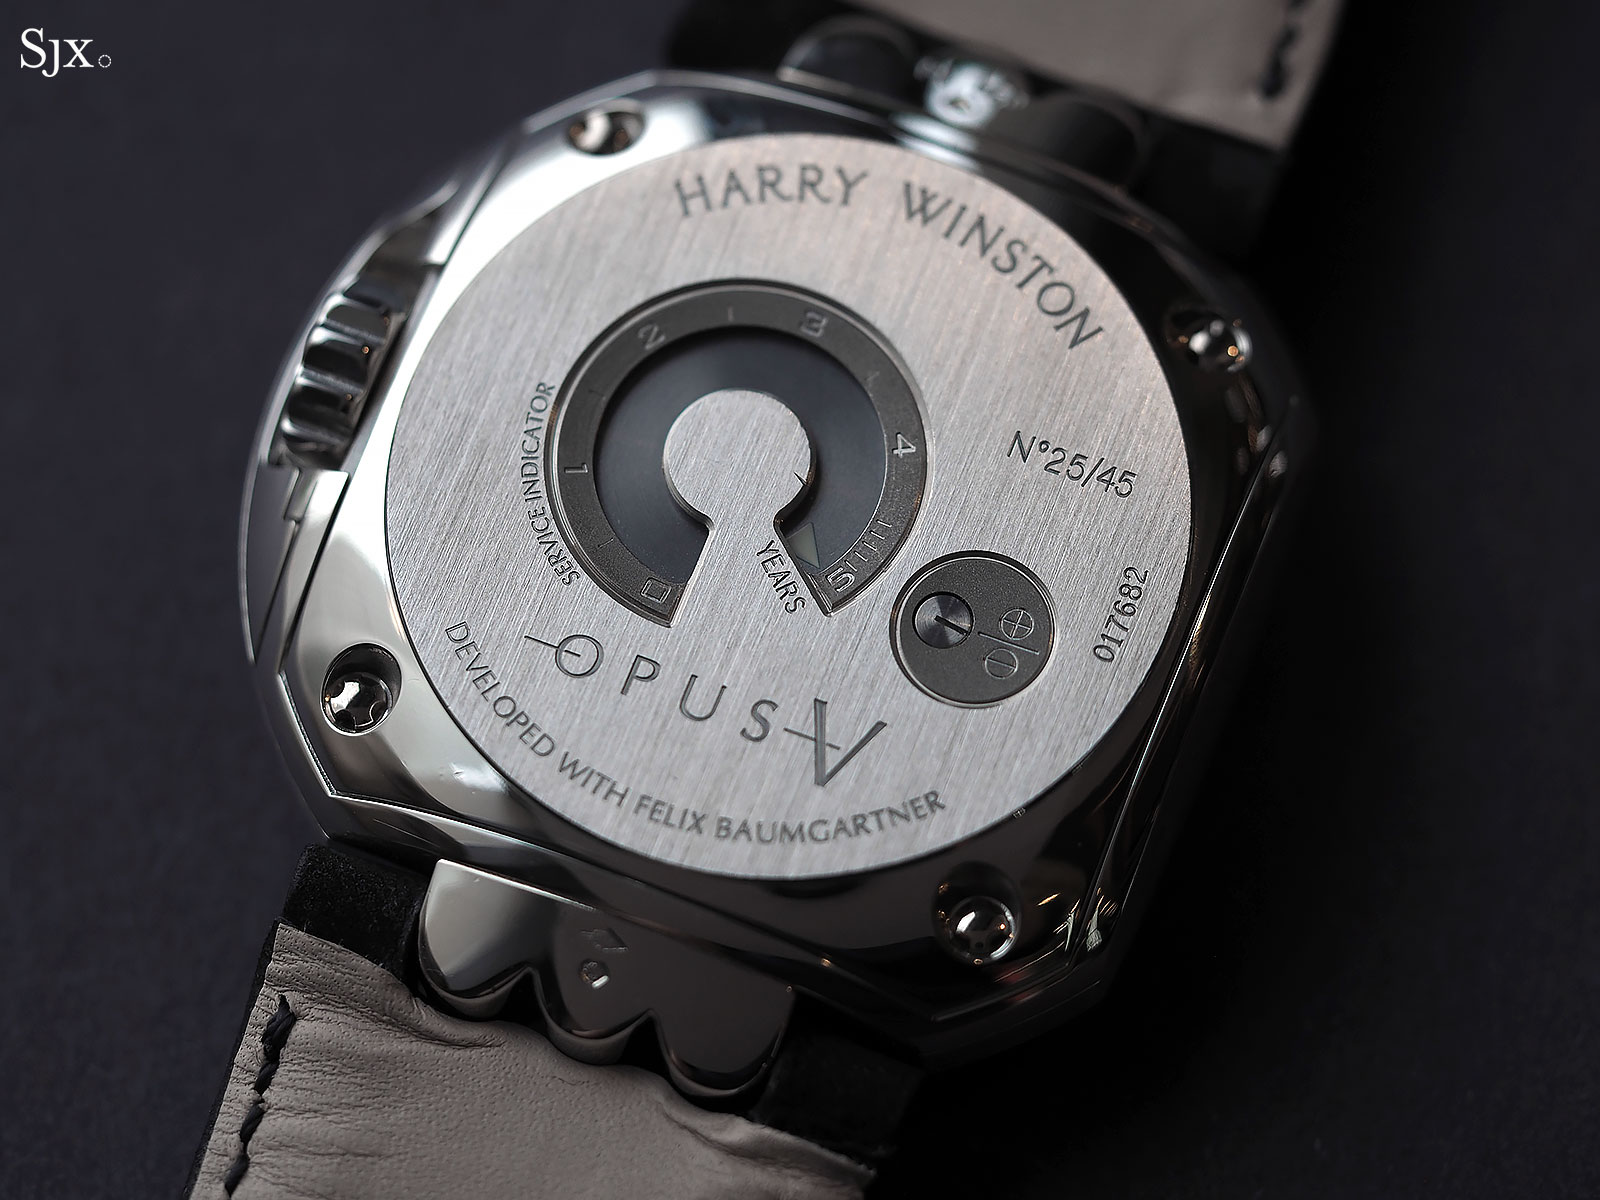 Harry Winston Opus V platinum 6